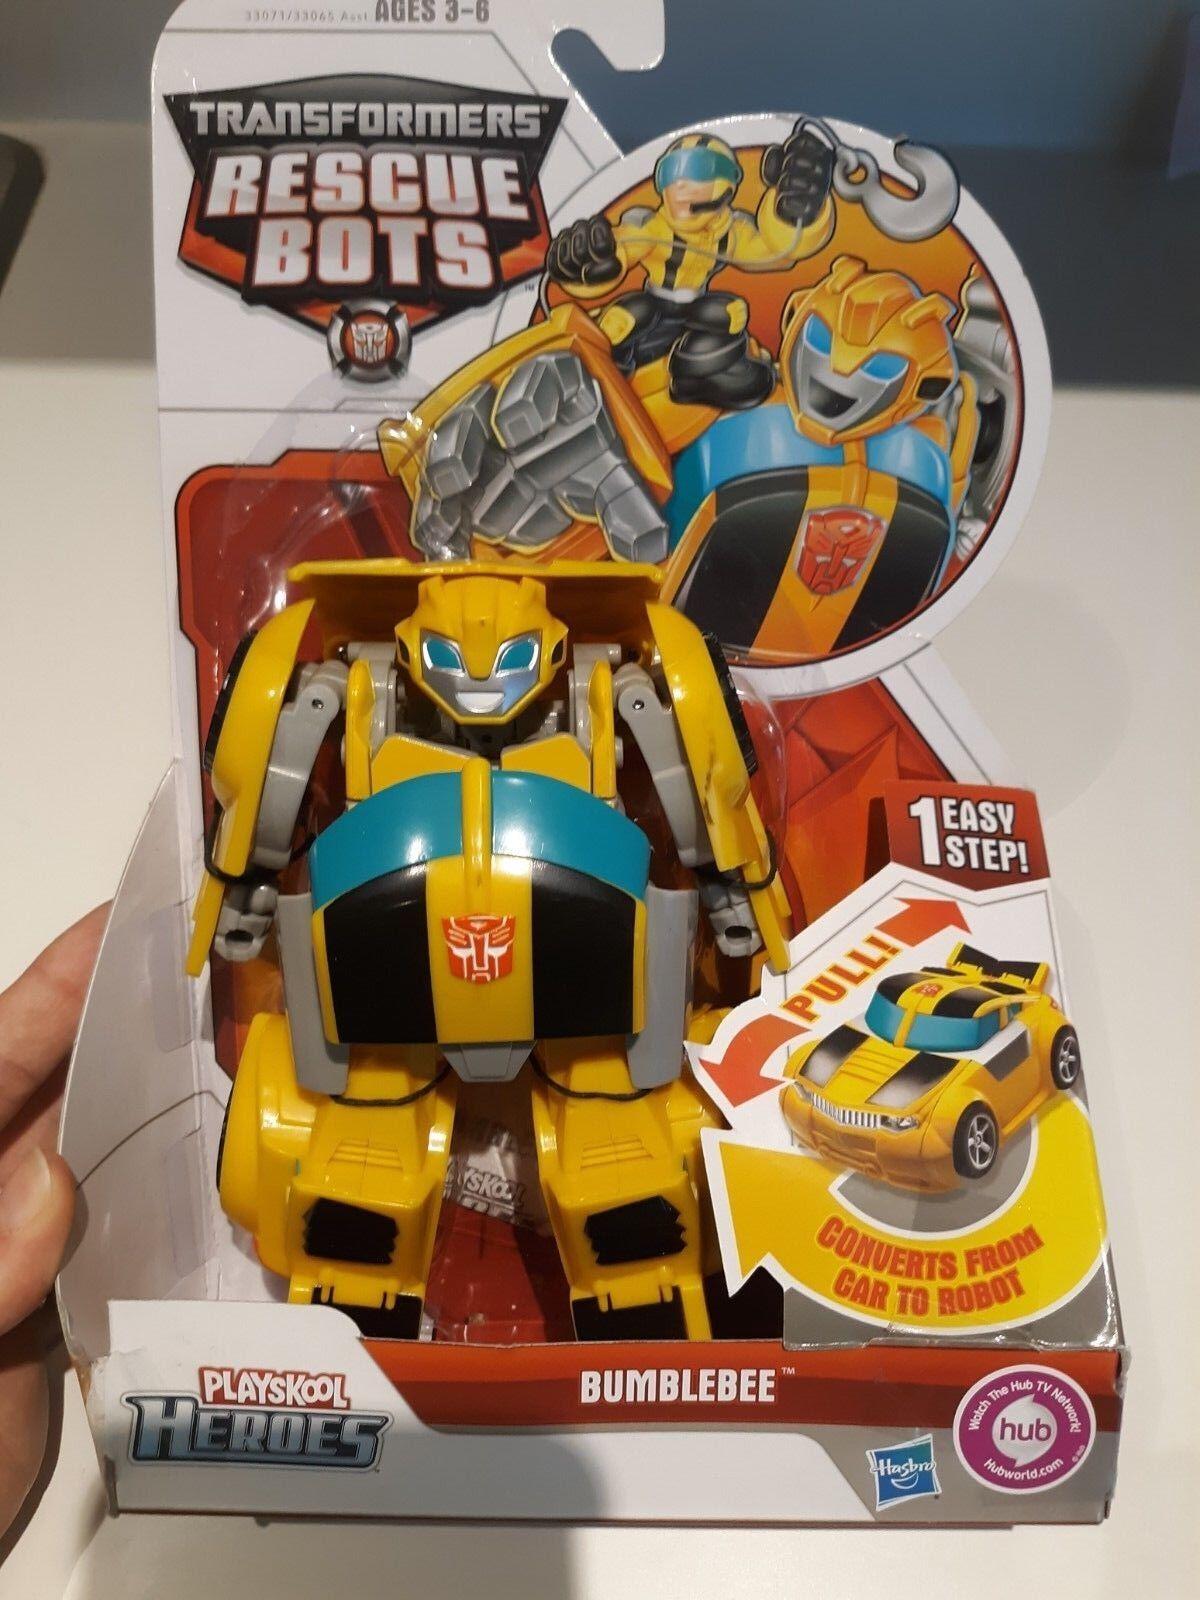 Hasbgold Transformers Playskool Rescue Bot - Bumblebee Original Edition